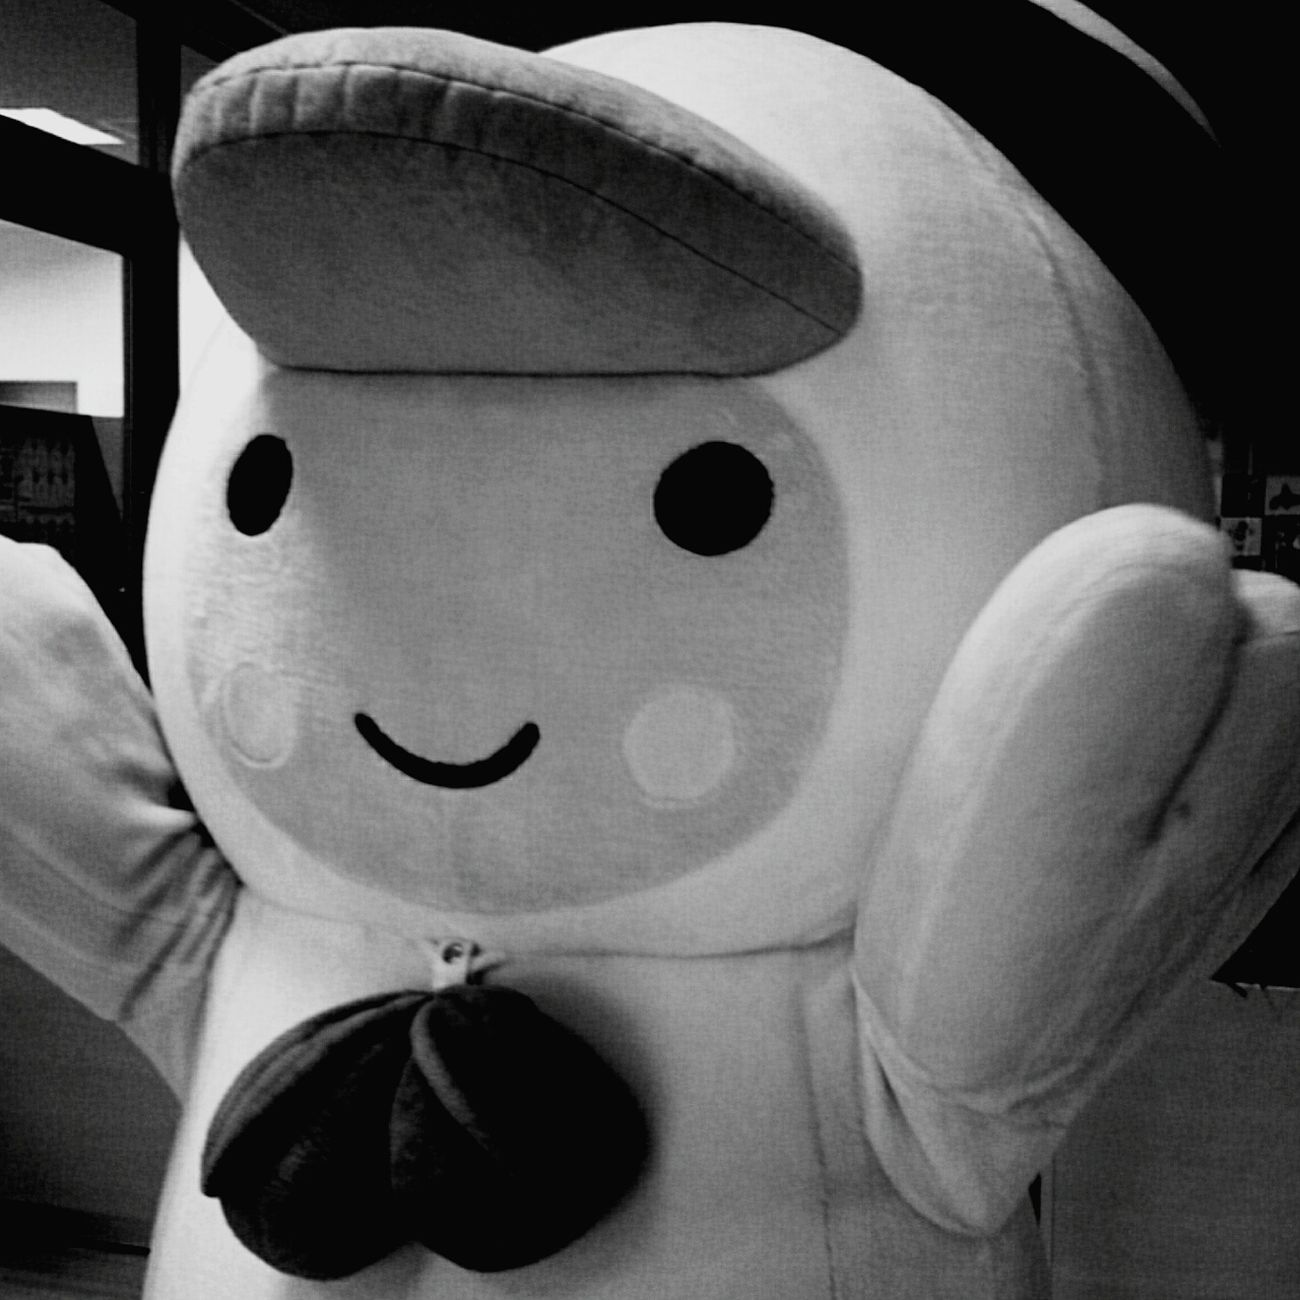 Hokkaido,Japan ご当地キャラ Tomachop Black & White Monochrome とまチョップ(・ω・)。